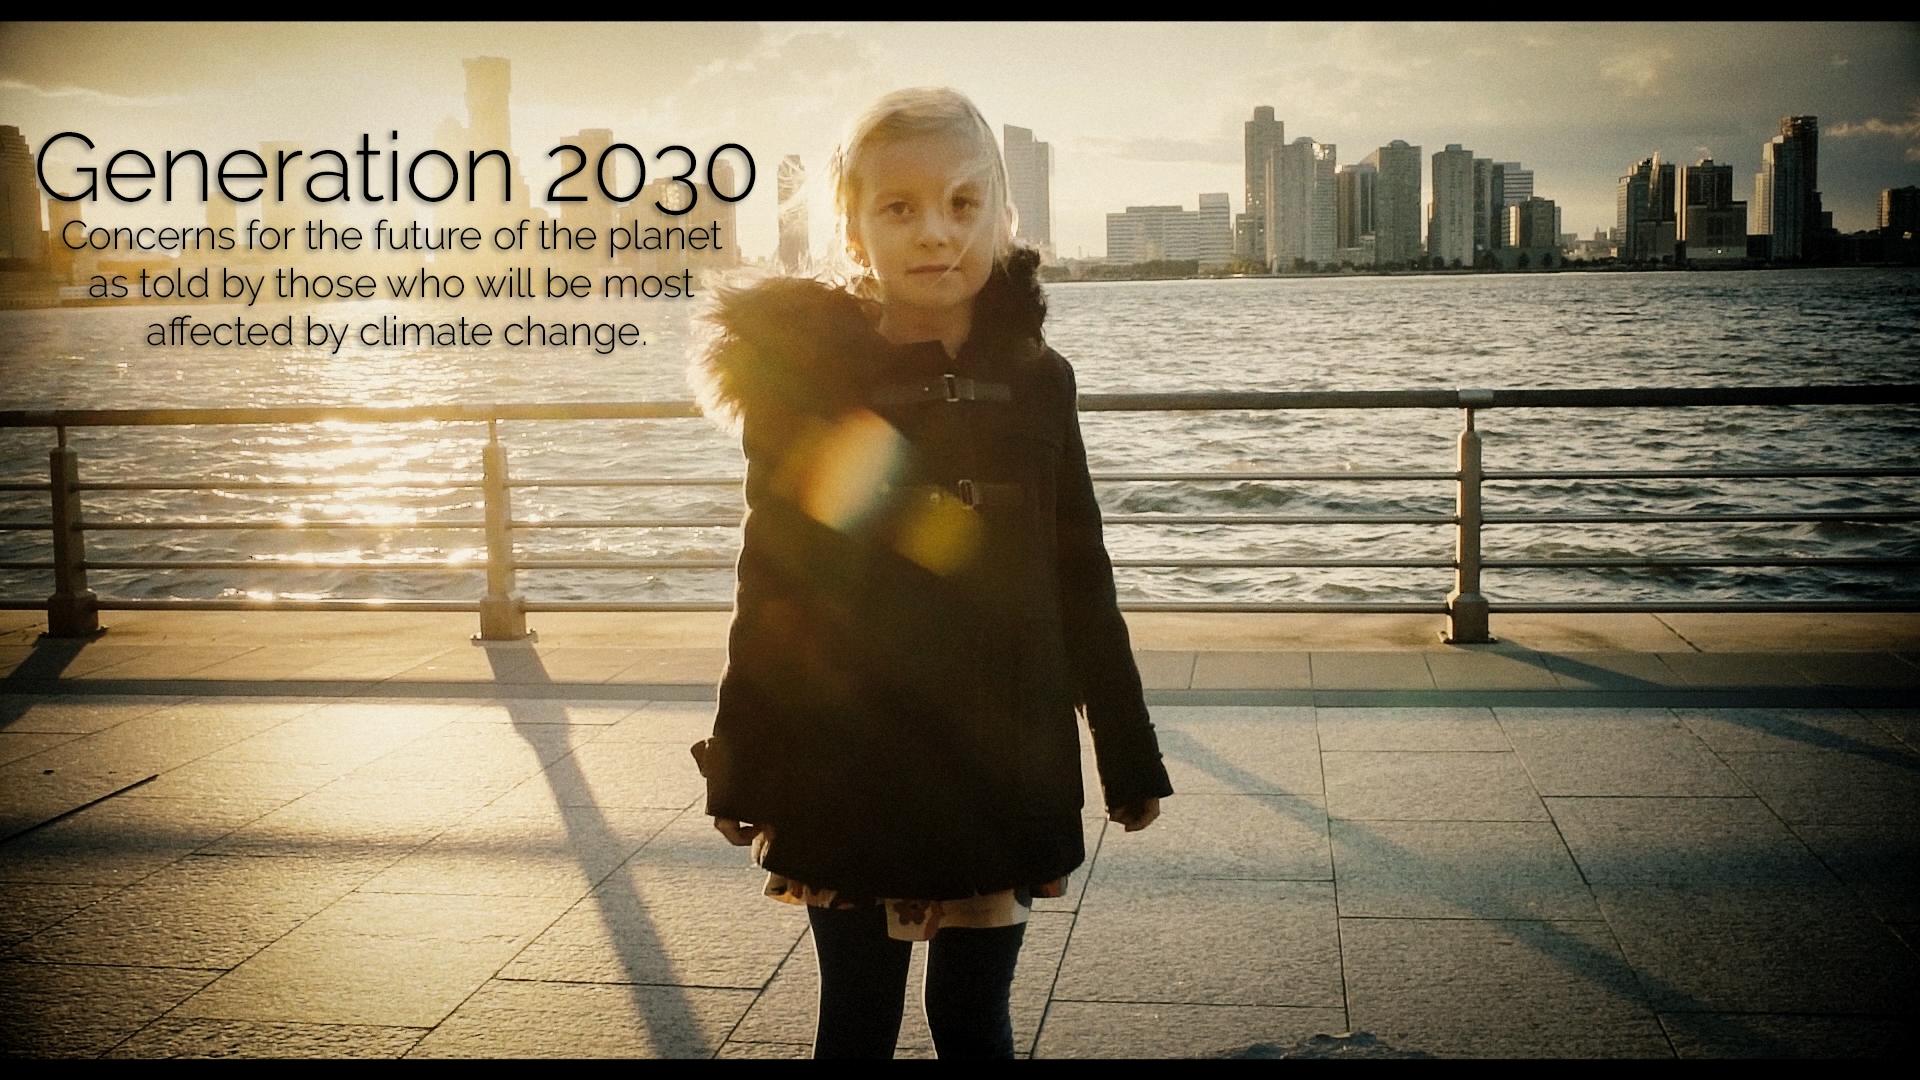 2030 title.jpg